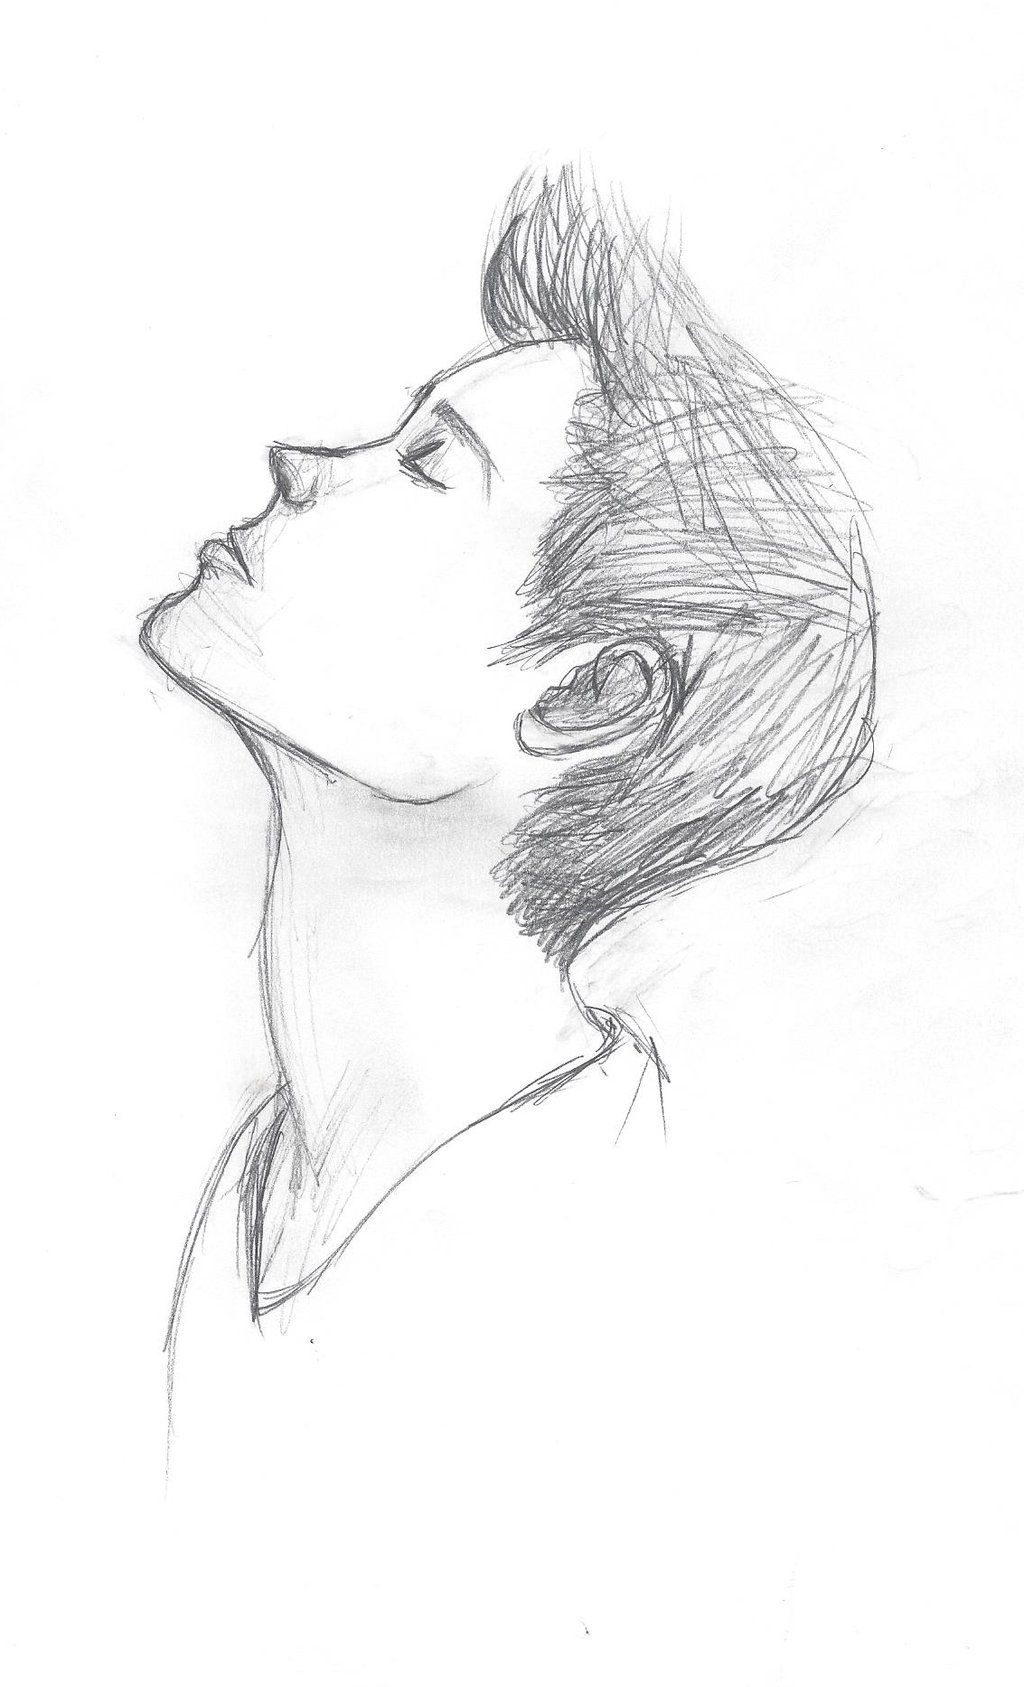 Pin By Vinayakk S B On Drawing List Pinterest Pencil Drawings